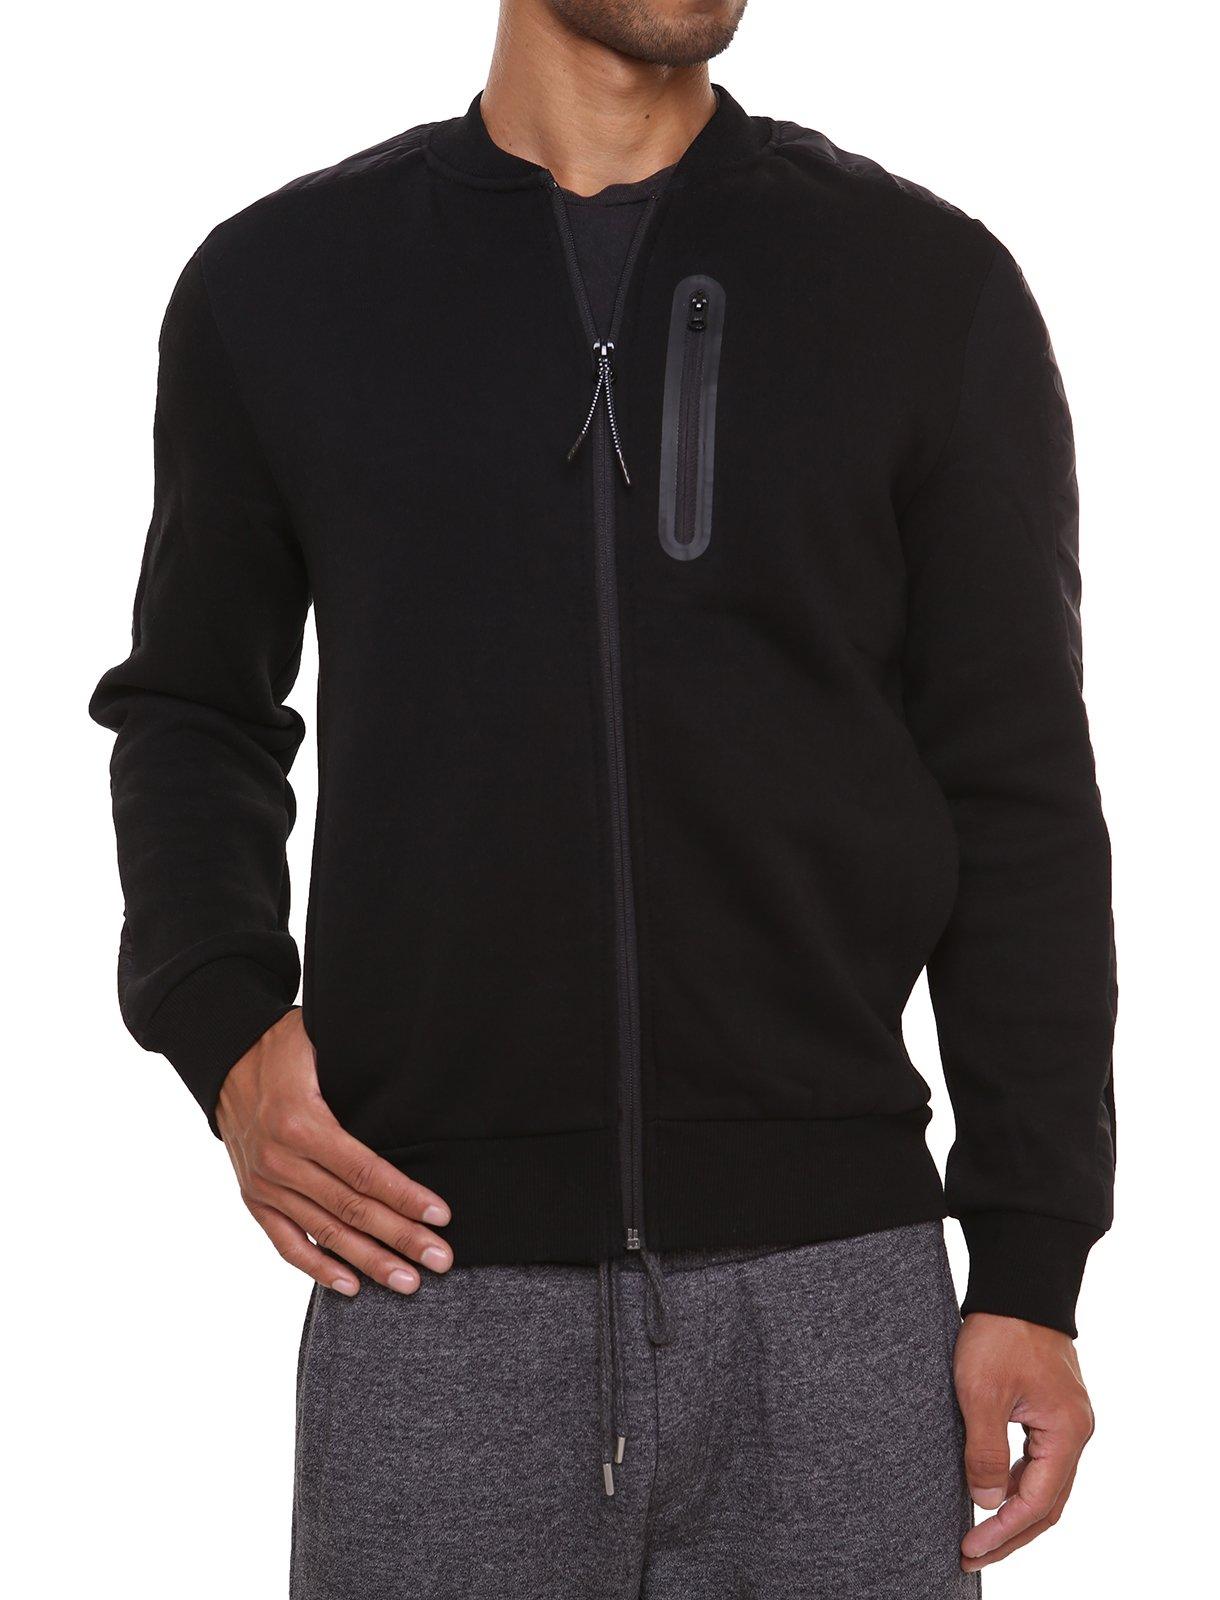 Fleece Sweatshirt Jacket Dotswarm Sweater-Comfort Front Zip Jacket Cozy Sport Outwear Casual,Black,X-Large by FORBIDEFENSE